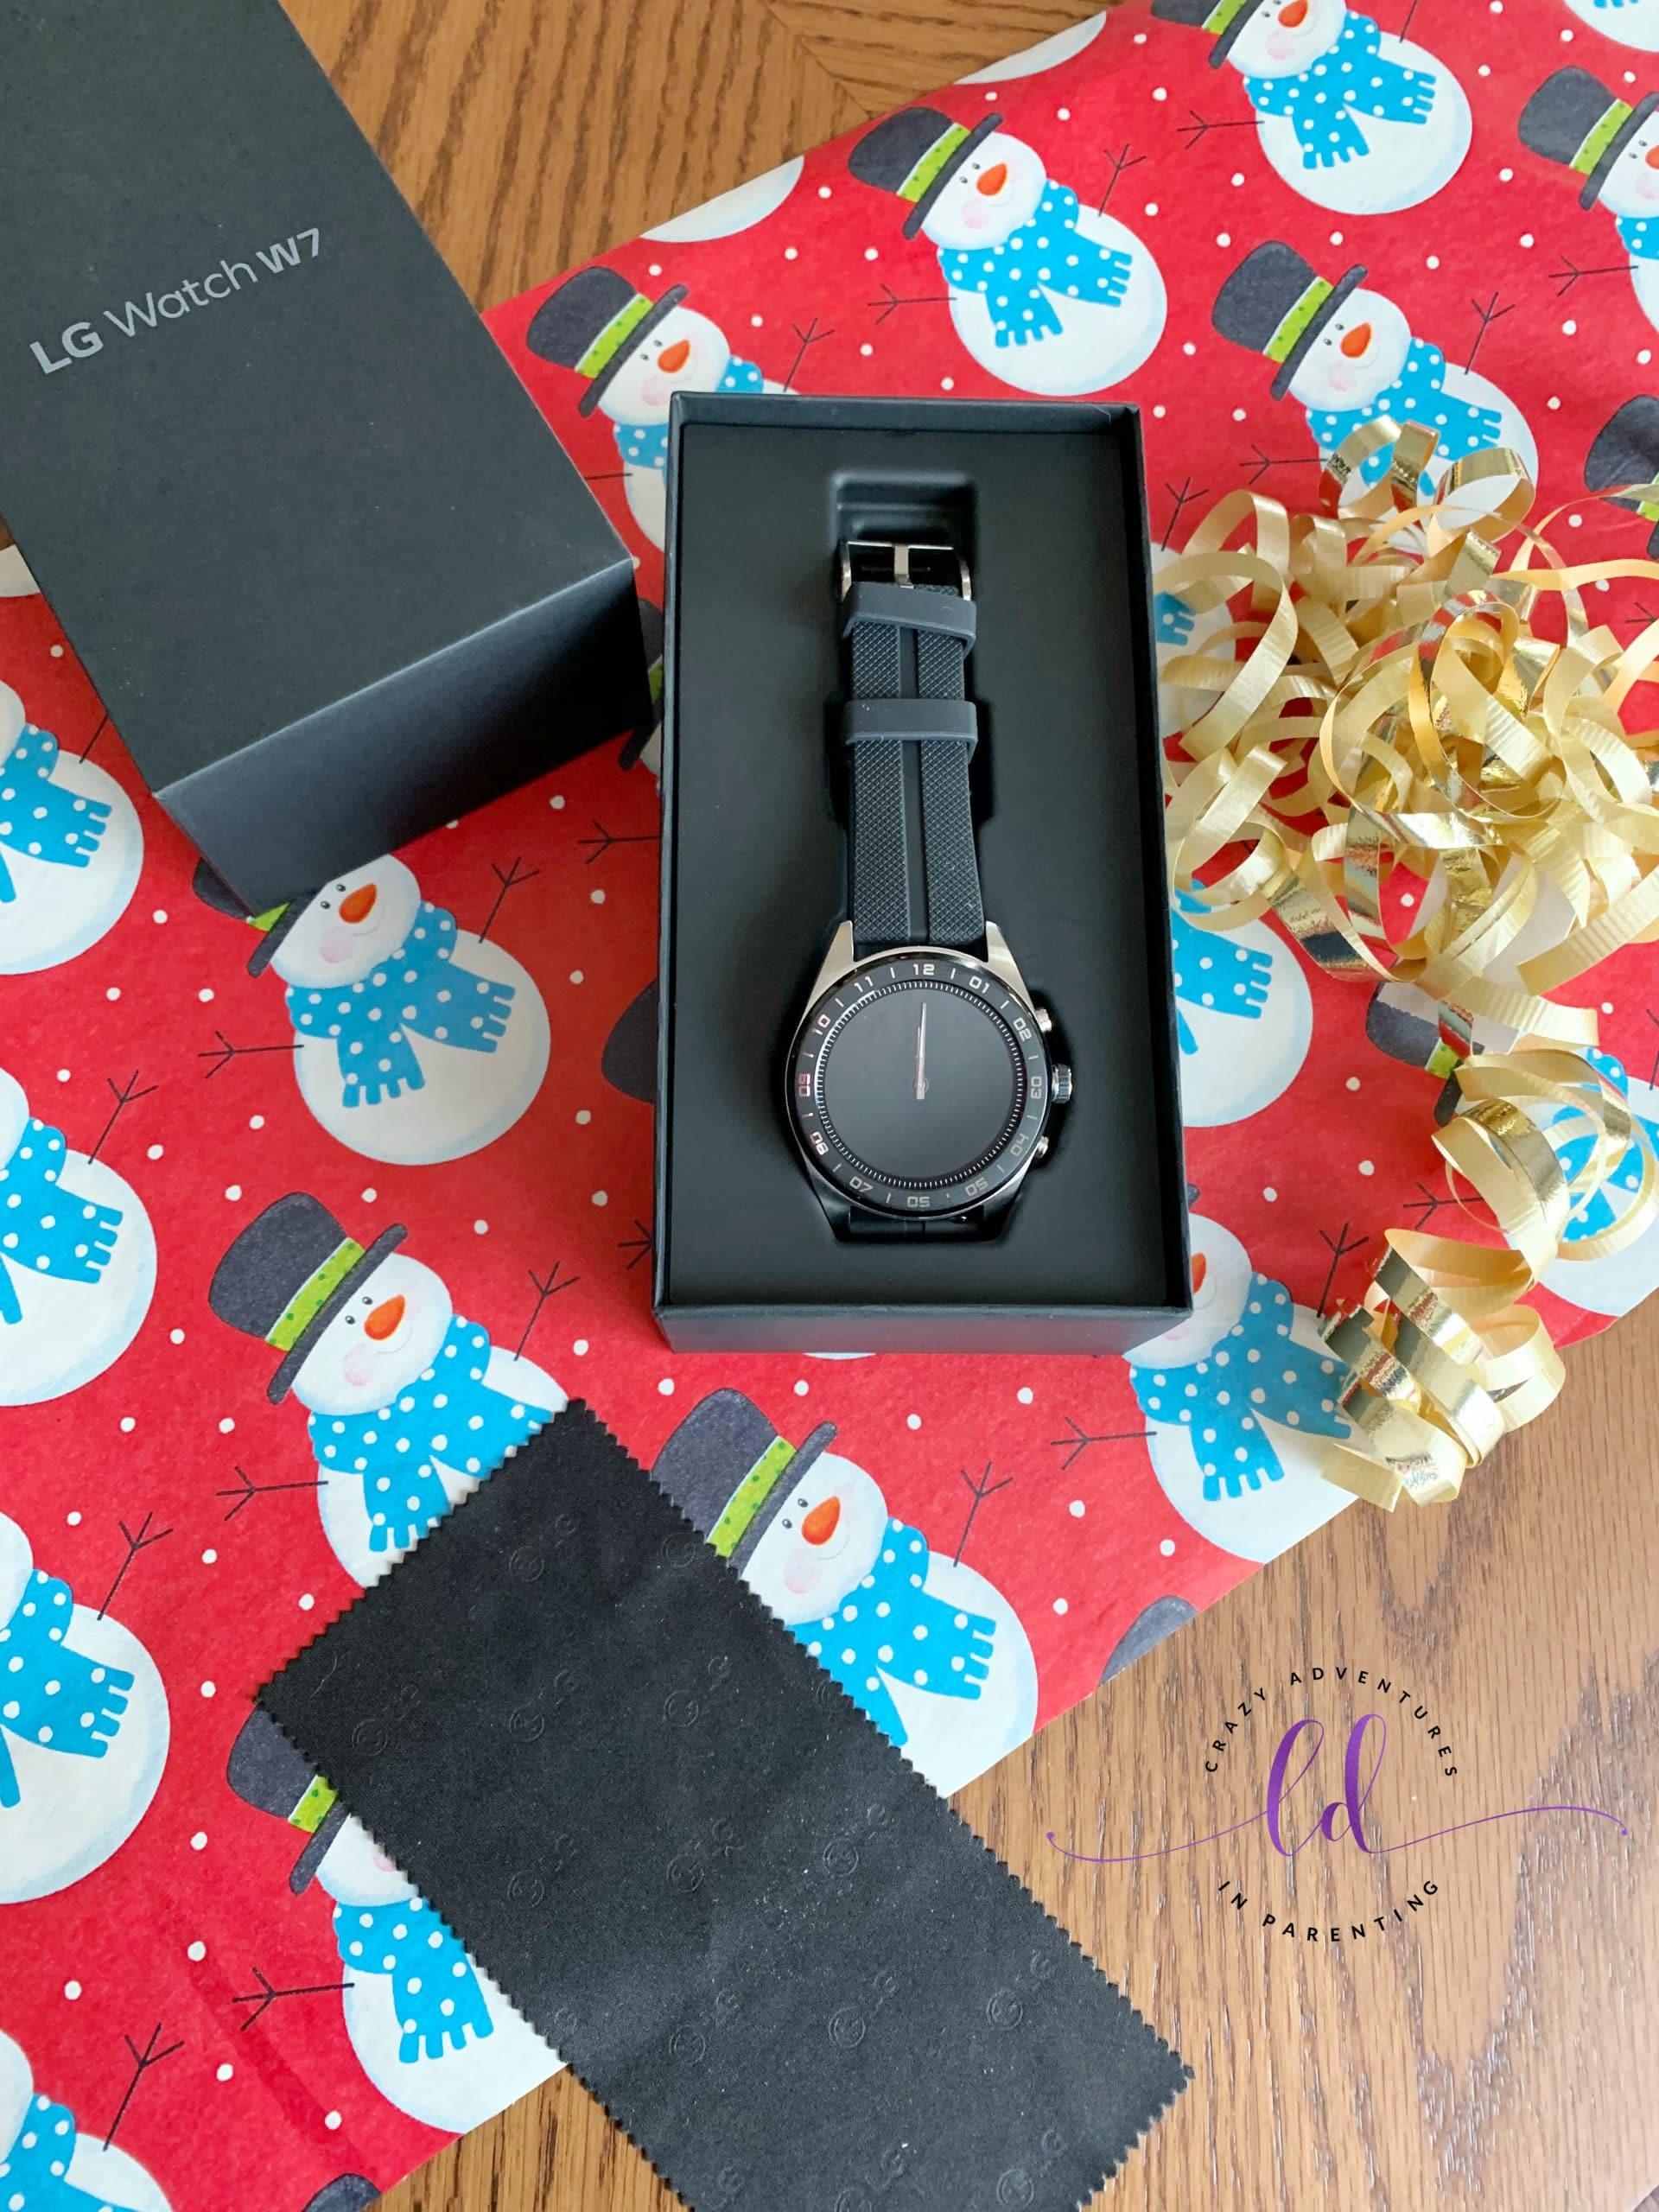 LG Watch W7 Smartwatch Gift